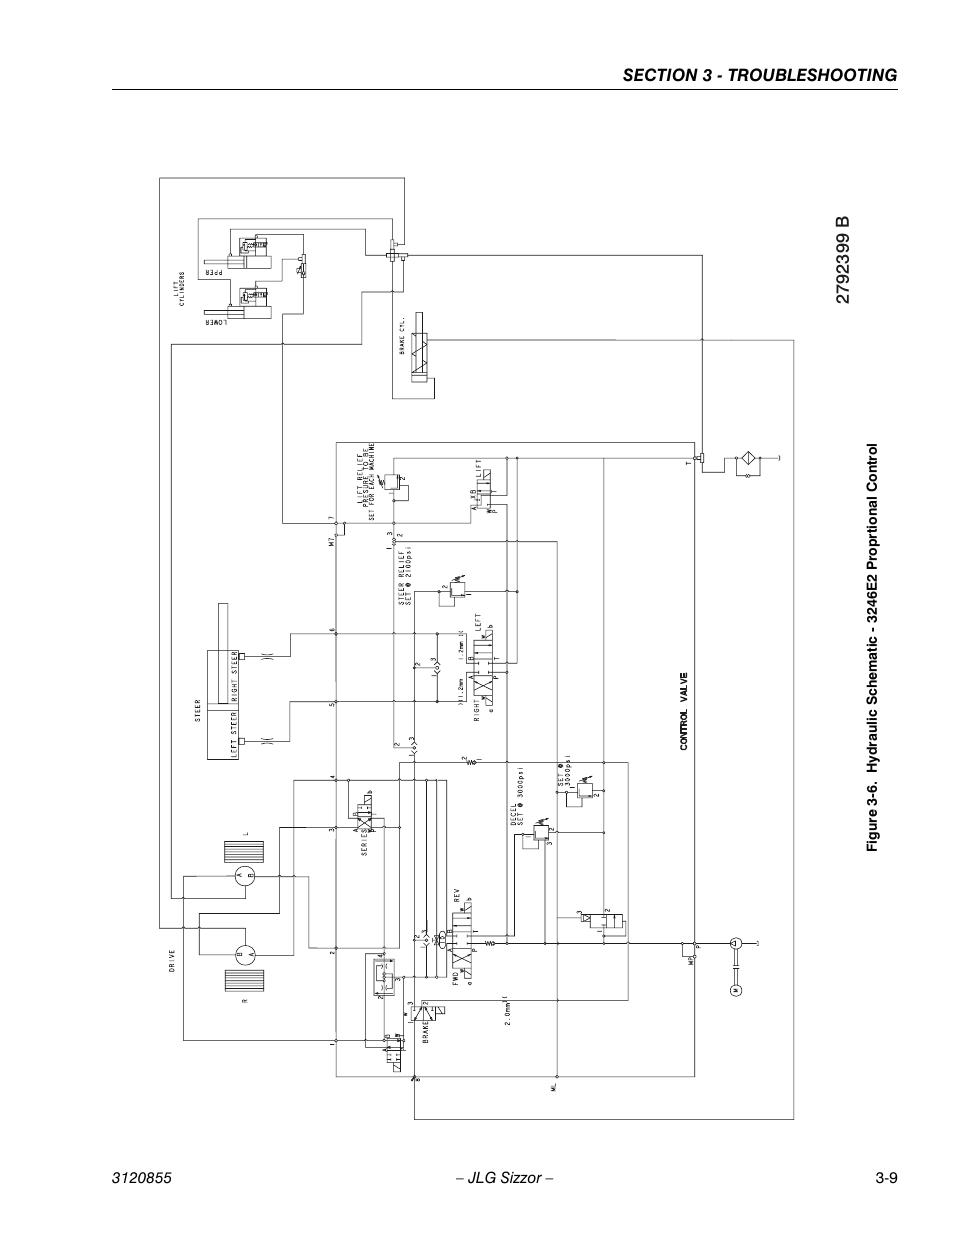 jlg 3246e2 service manual user manual